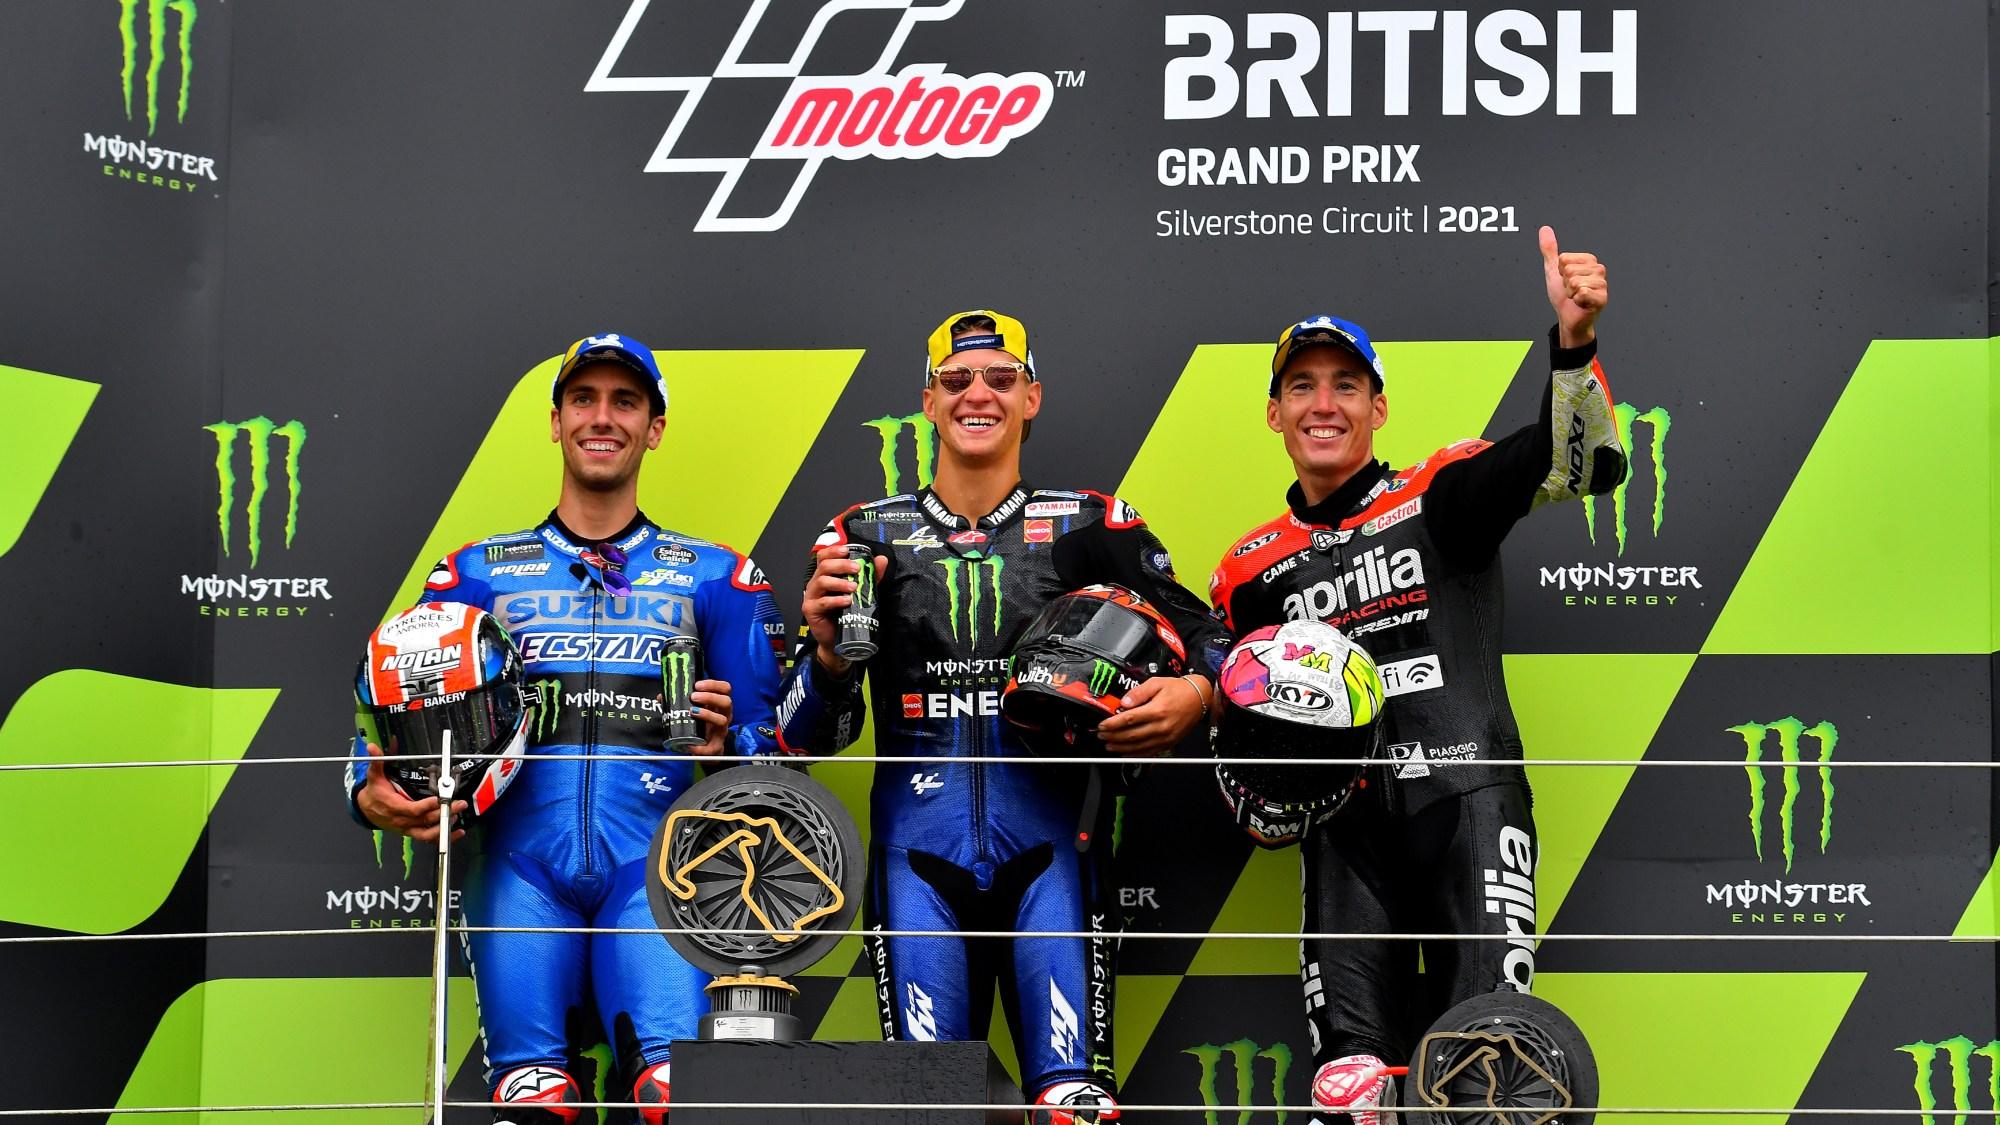 British MotoGP: after ten years of trying Italian underdog Aprilia scores its first MotoGP podium - Motor Sport